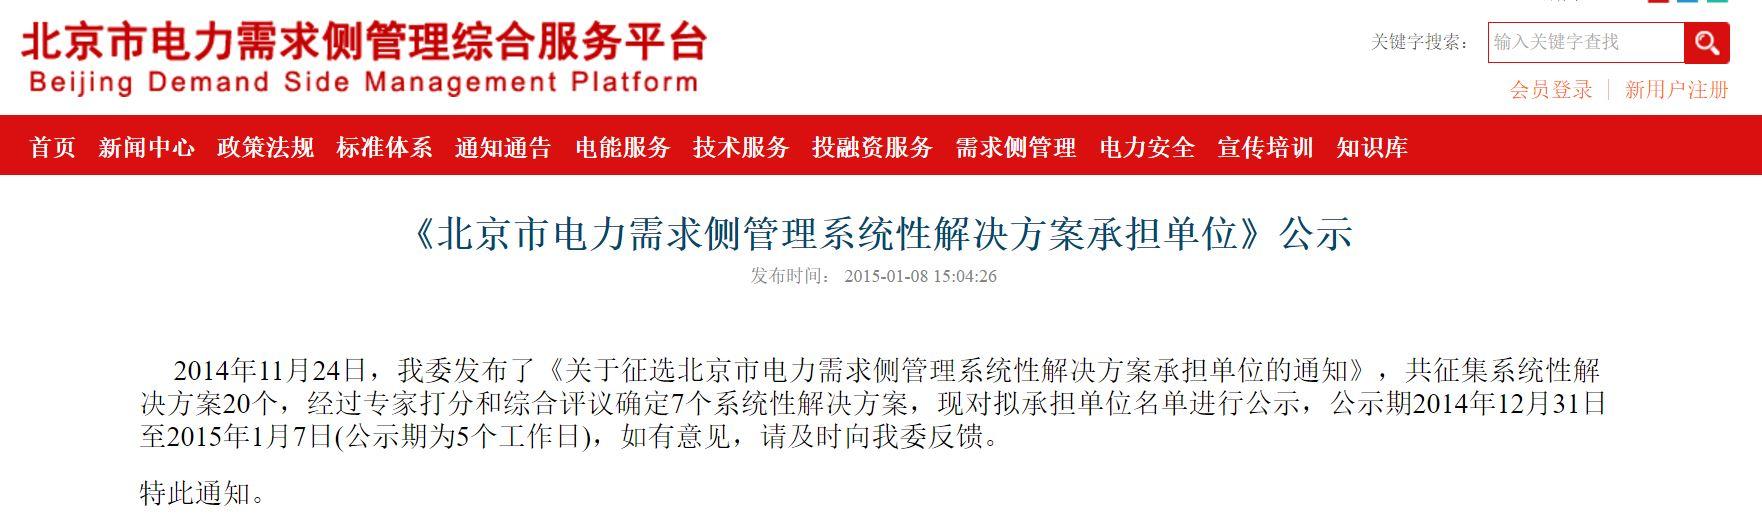 Beijing's demand response program was coordinated through the online DSM platform.